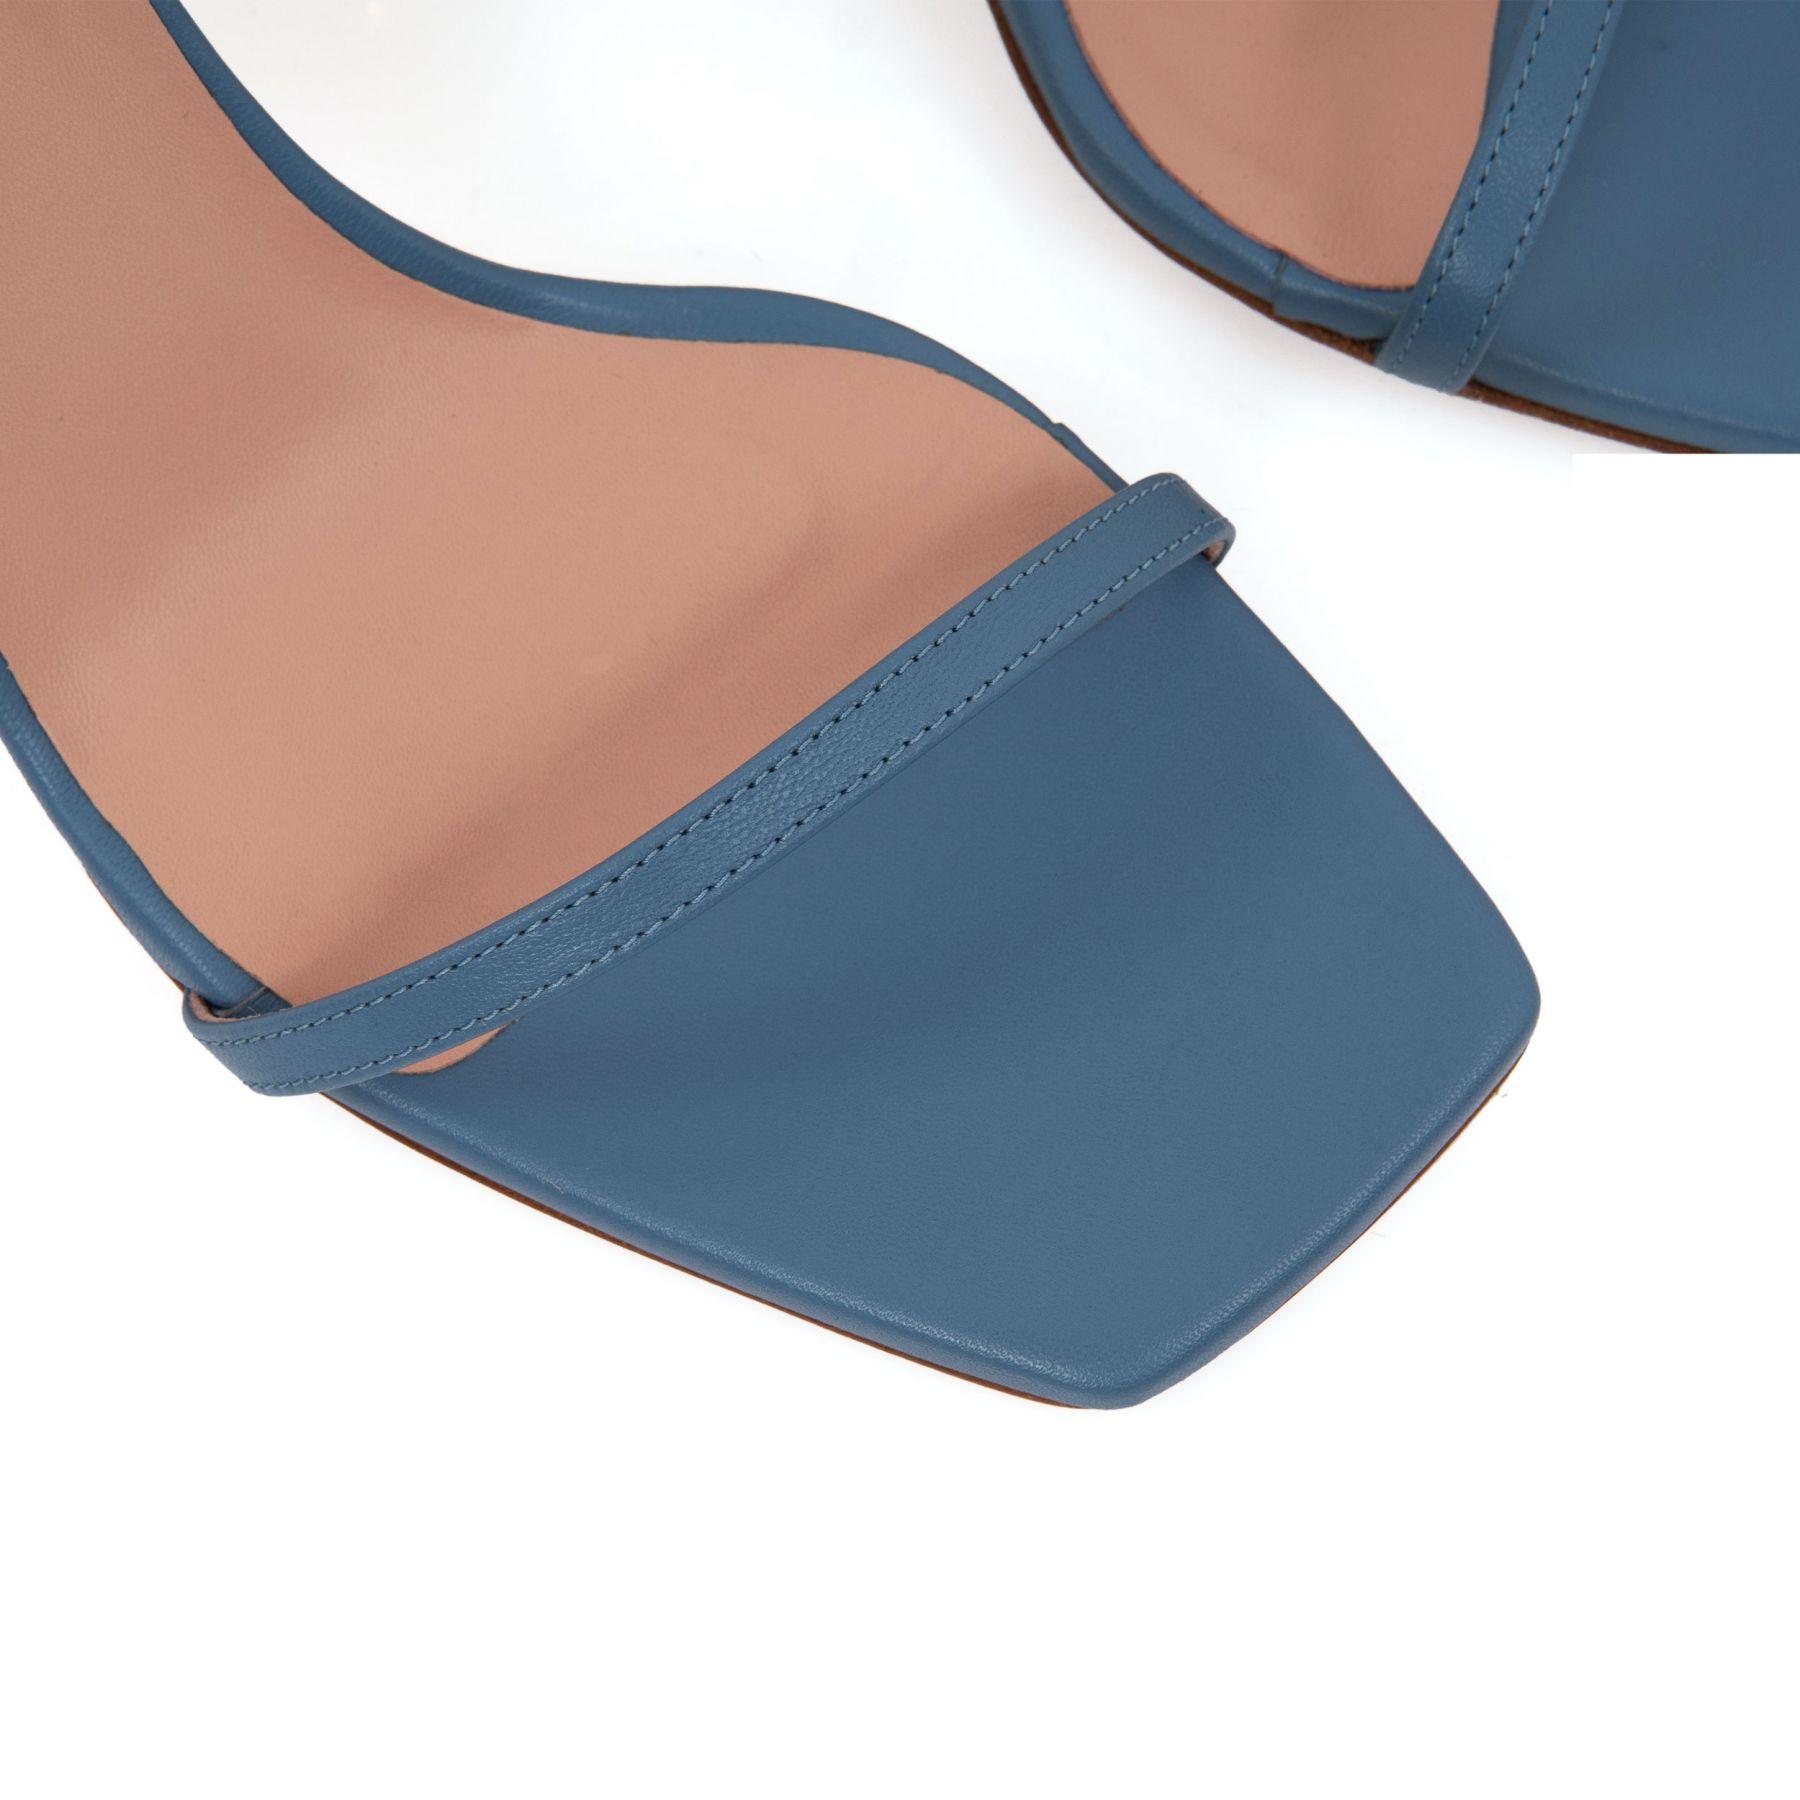 Босоножки Gia Bacio 03 голубые